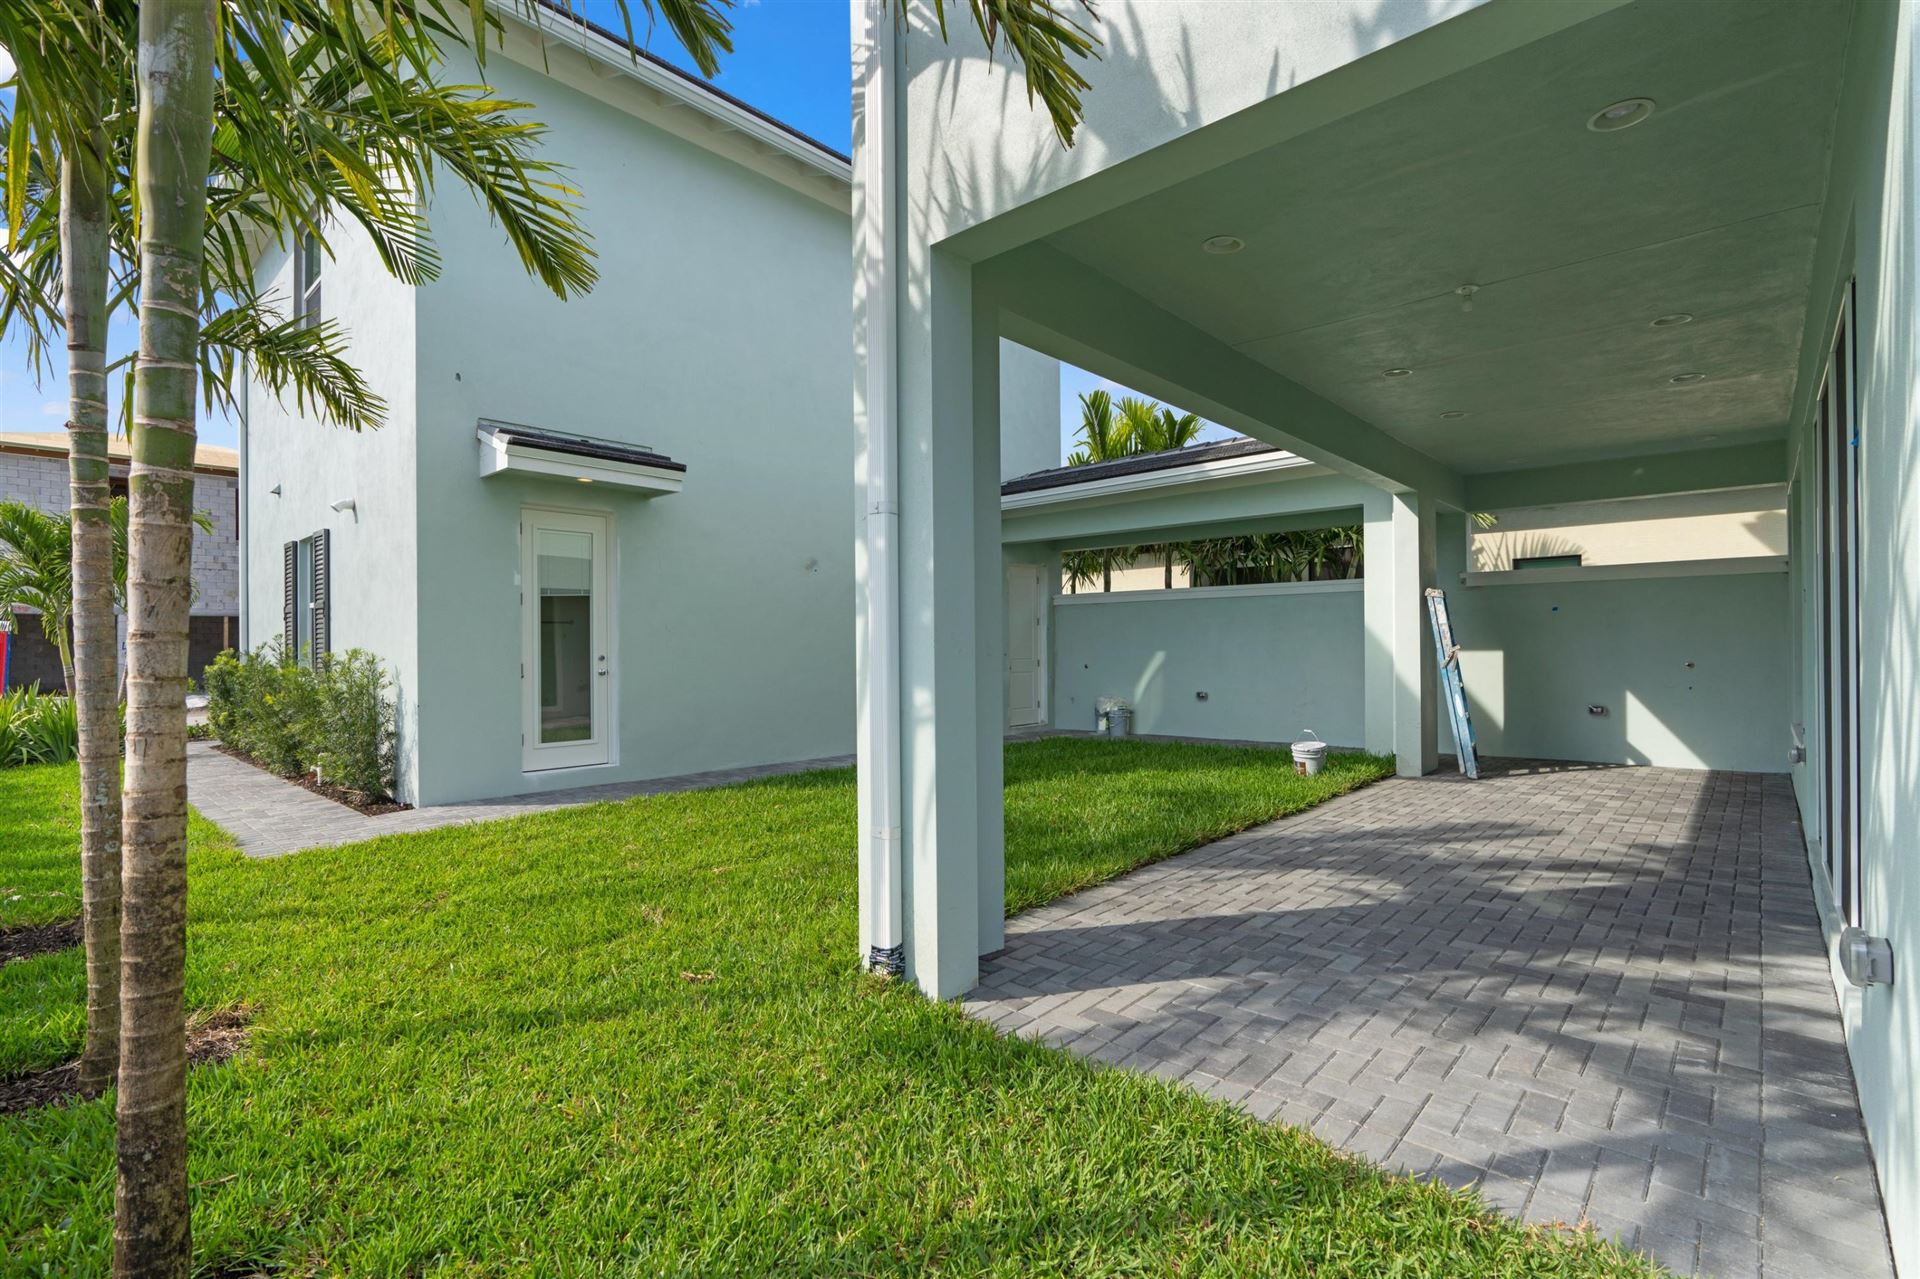 Photo of 13335 Machiavelli Way, Palm Beach Gardens, FL 33410 (MLS # RX-10684979)